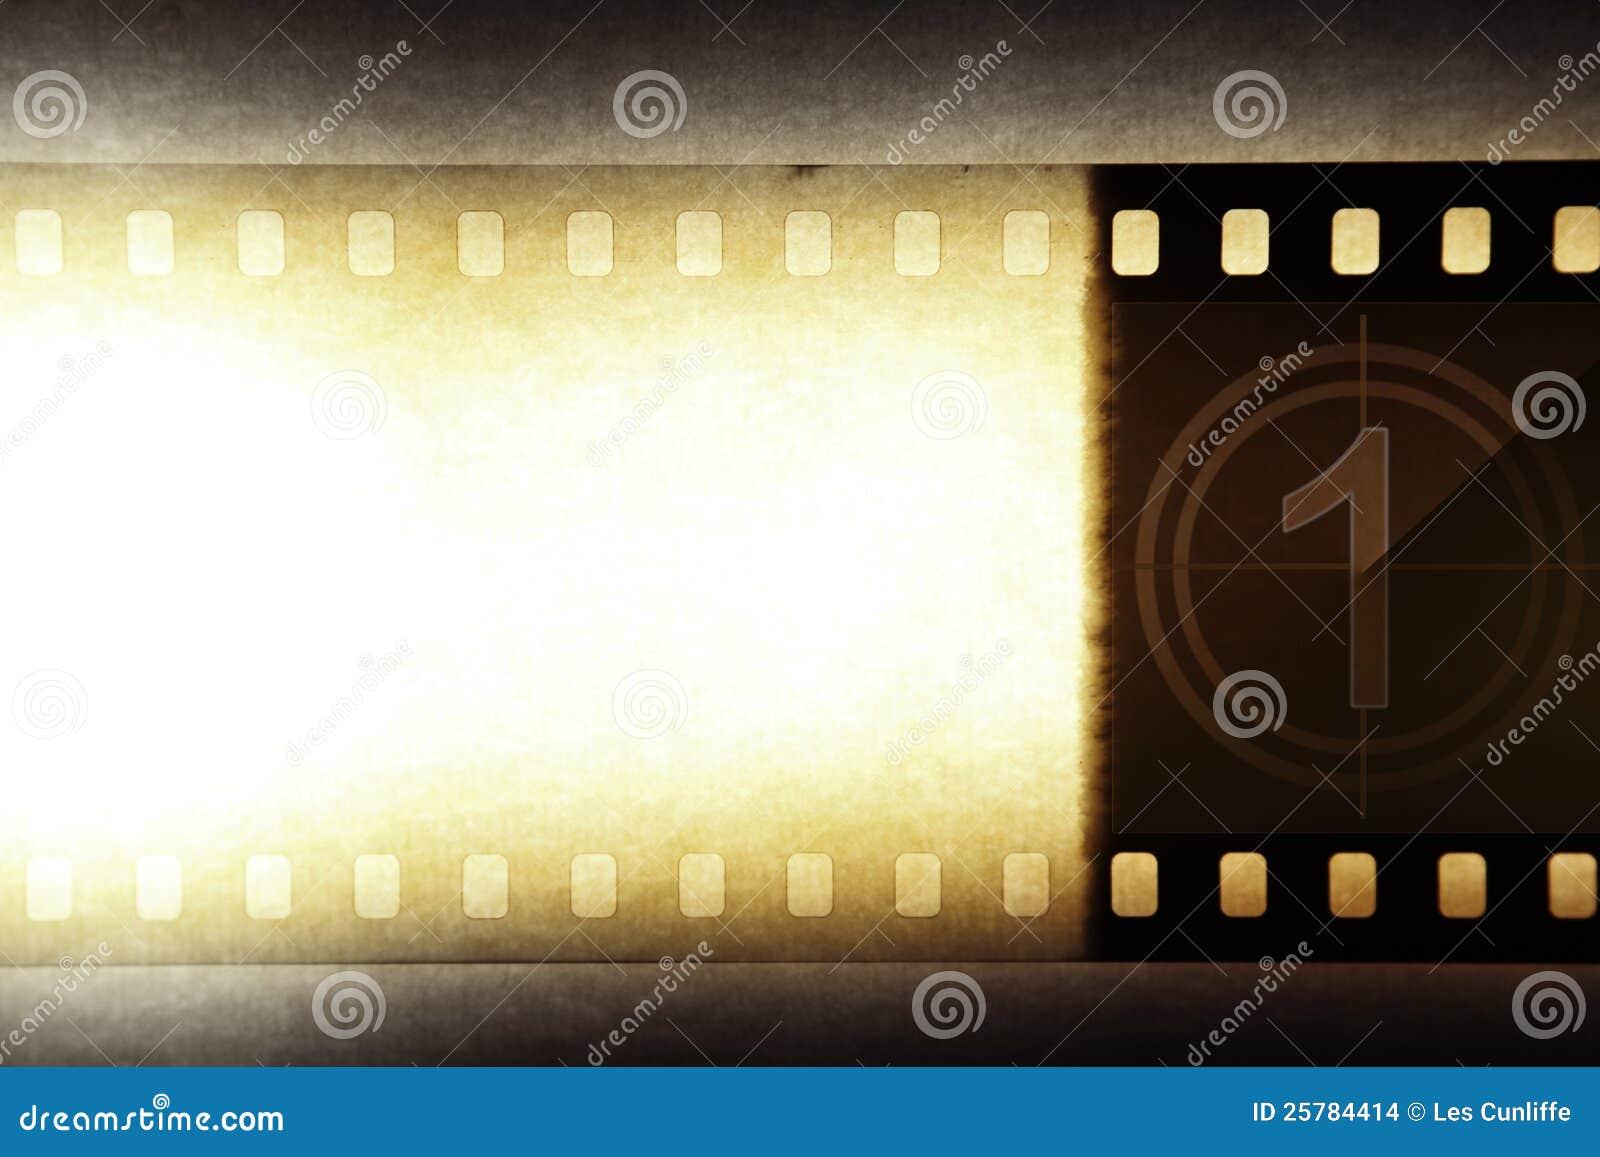 Film Negative Background Stock Images - Image: 25784414